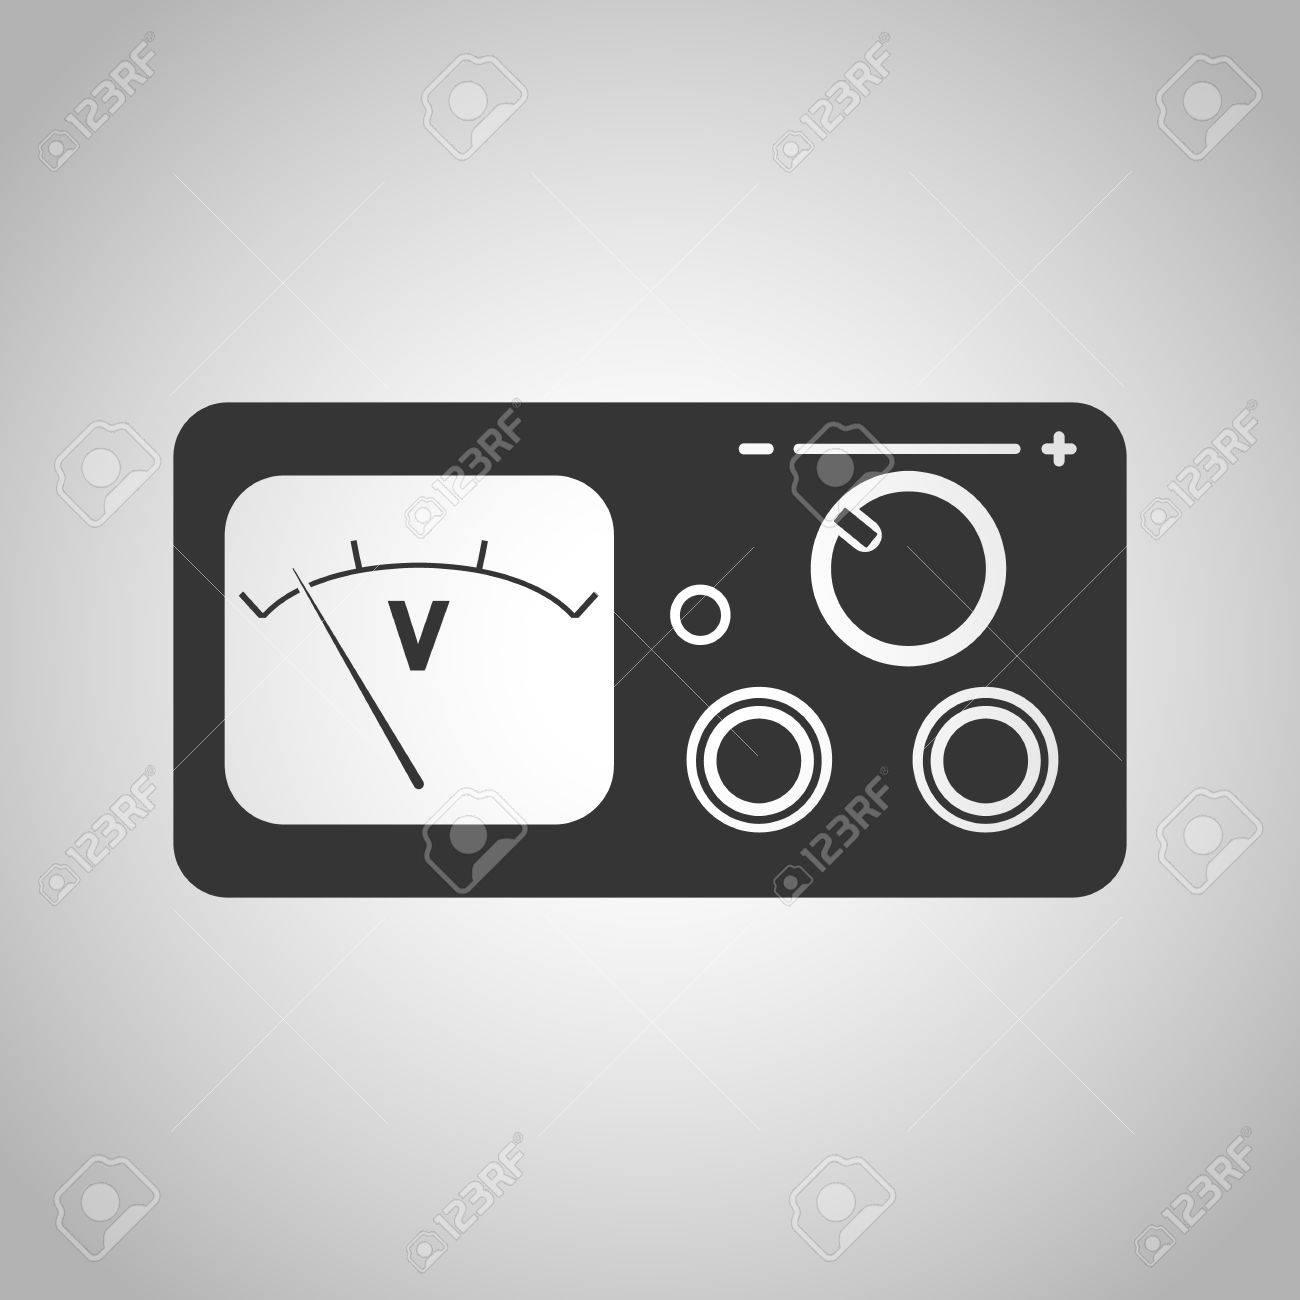 Fancy Symbol For Dc Power Ensign - Wiring Diagram Ideas - blogitia.com